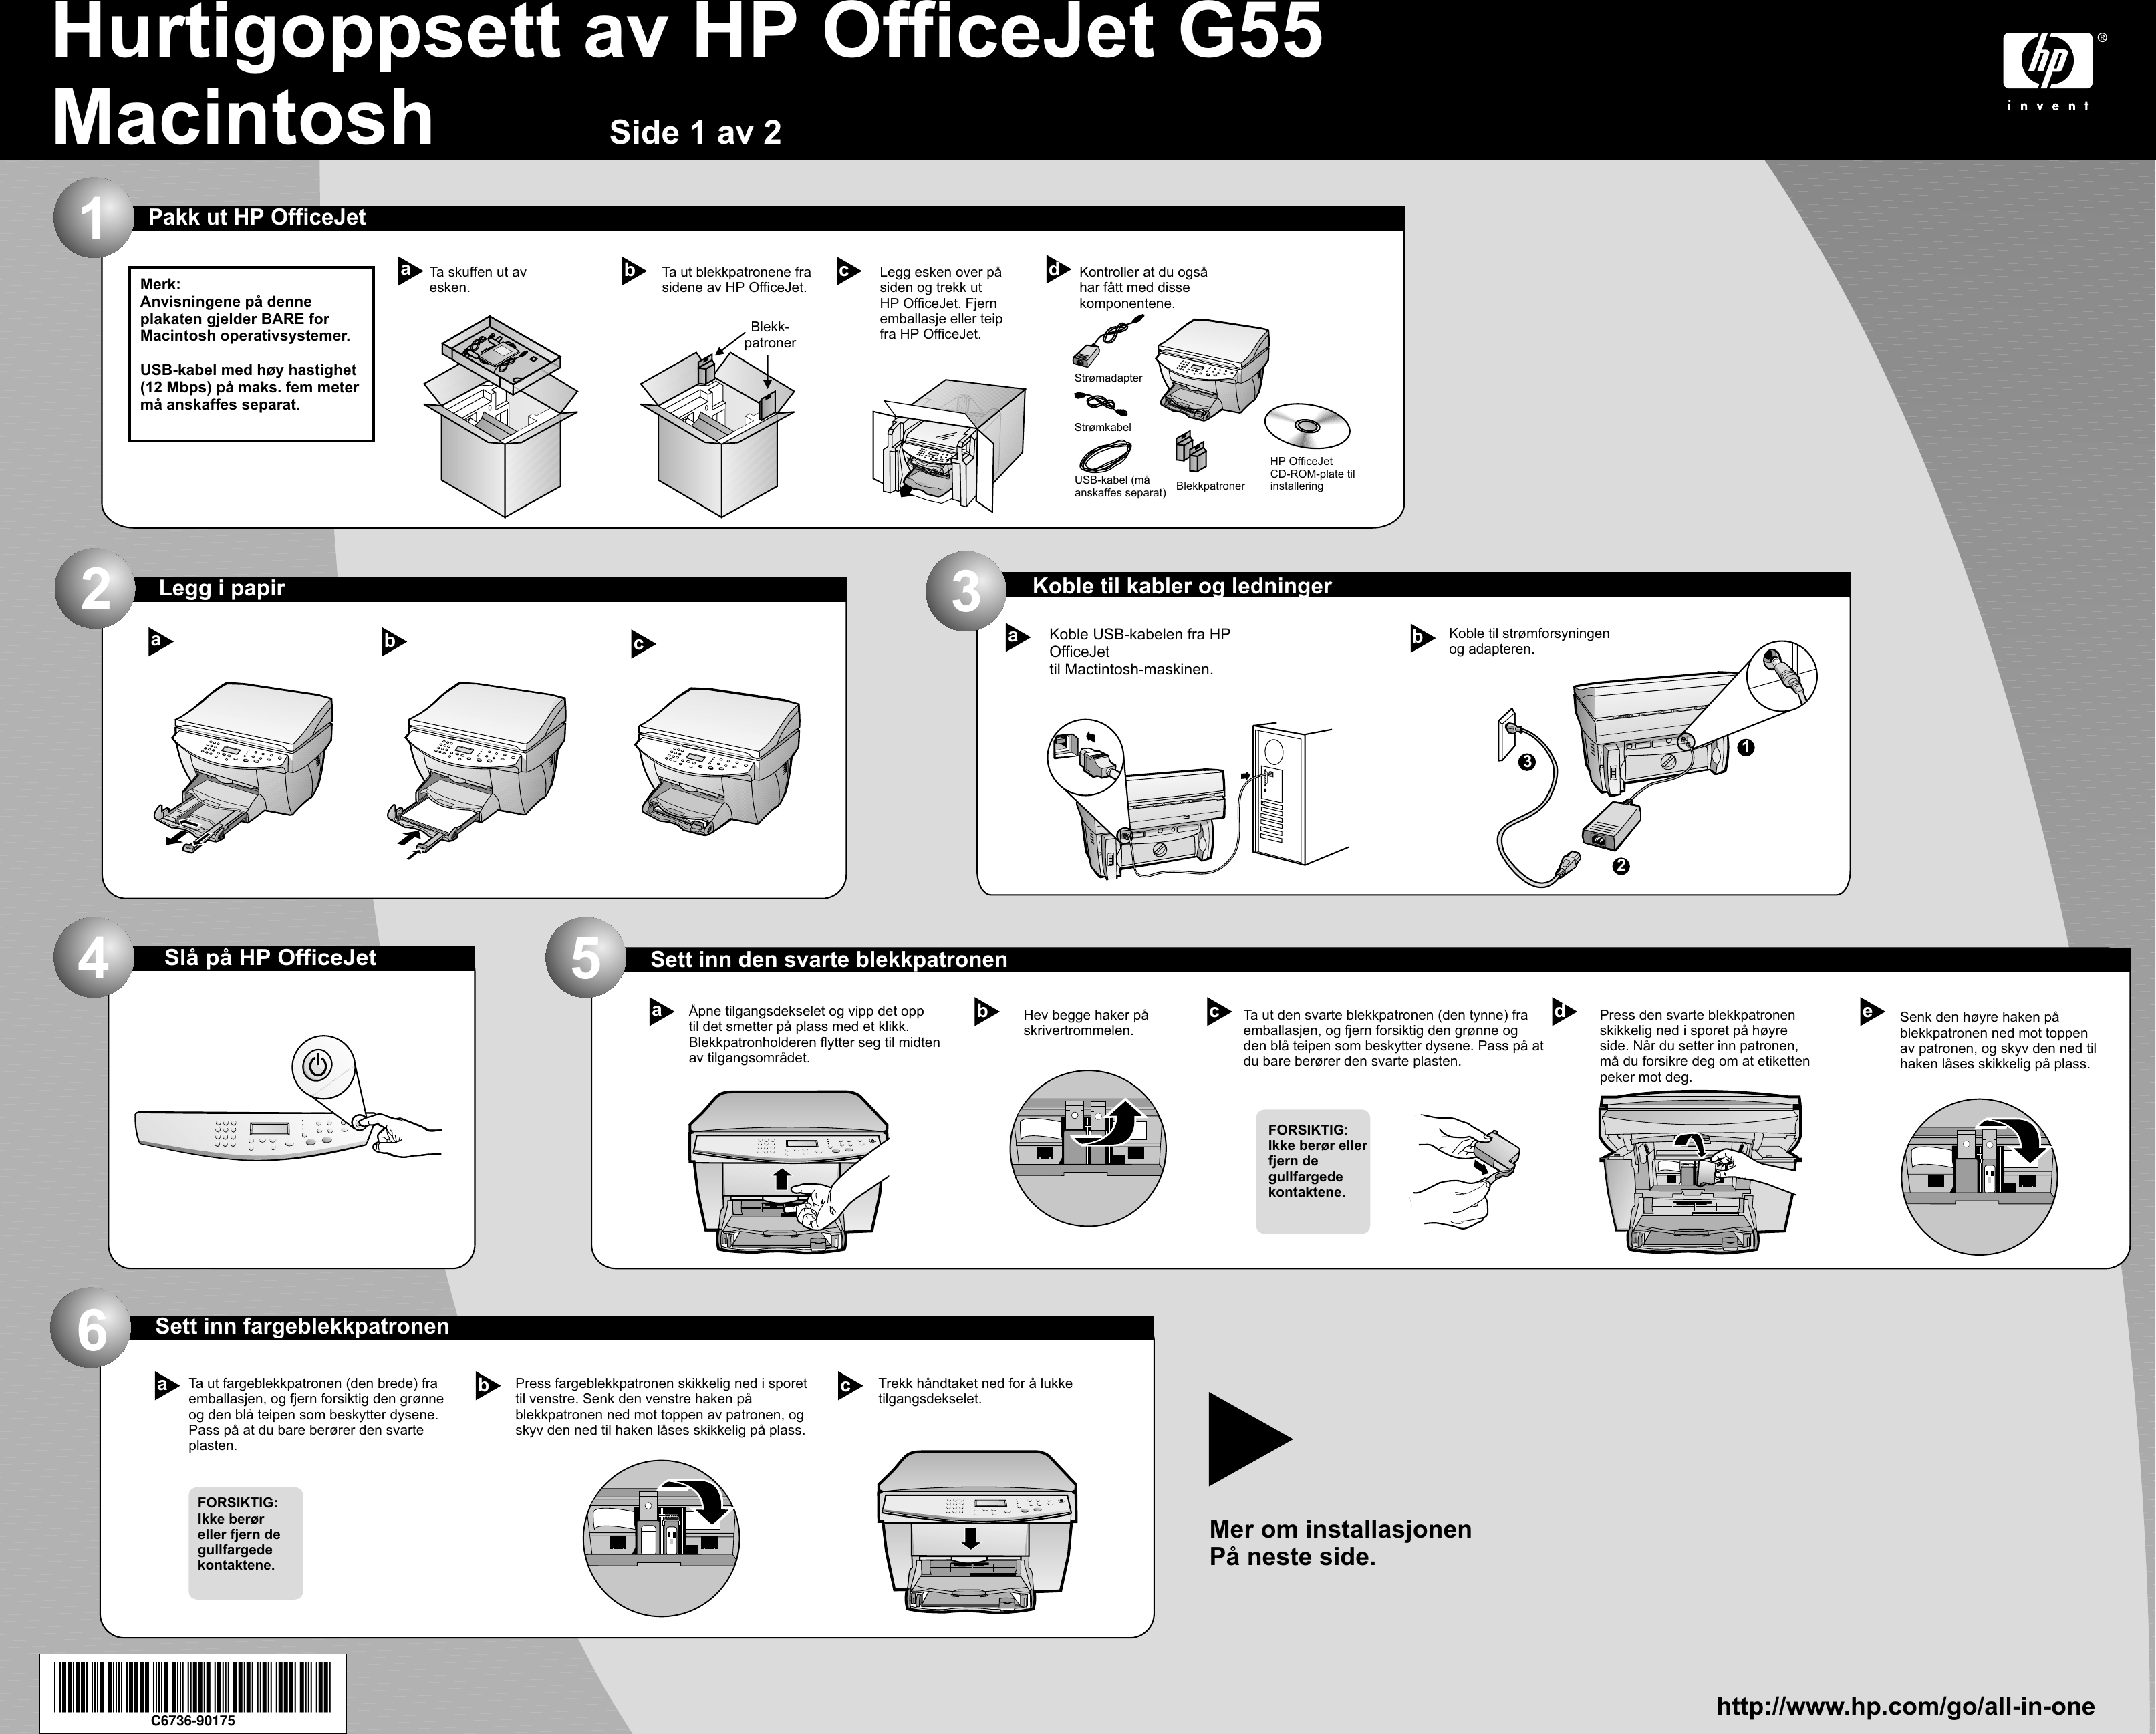 hp office jet g55 norwegian quick setup poster for macintosh bpu03174 rh usermanual wiki